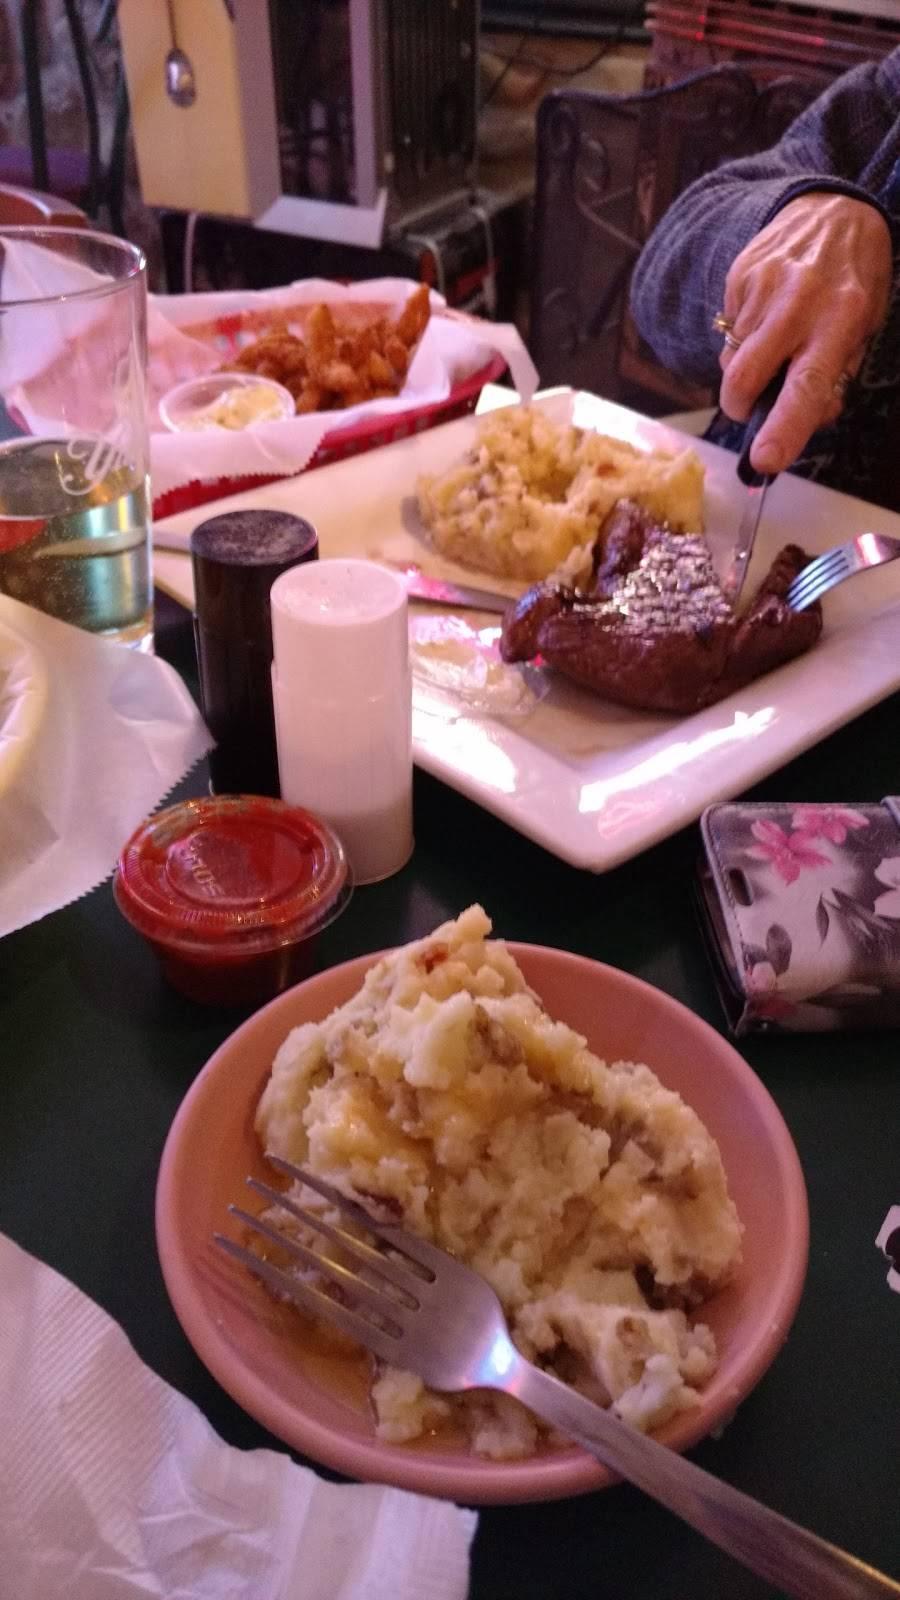 LAF-A-Lot | restaurant | 100 Laf a Lot Rd, Wayland, NY 14572, USA | 5857283722 OR +1 585-728-3722